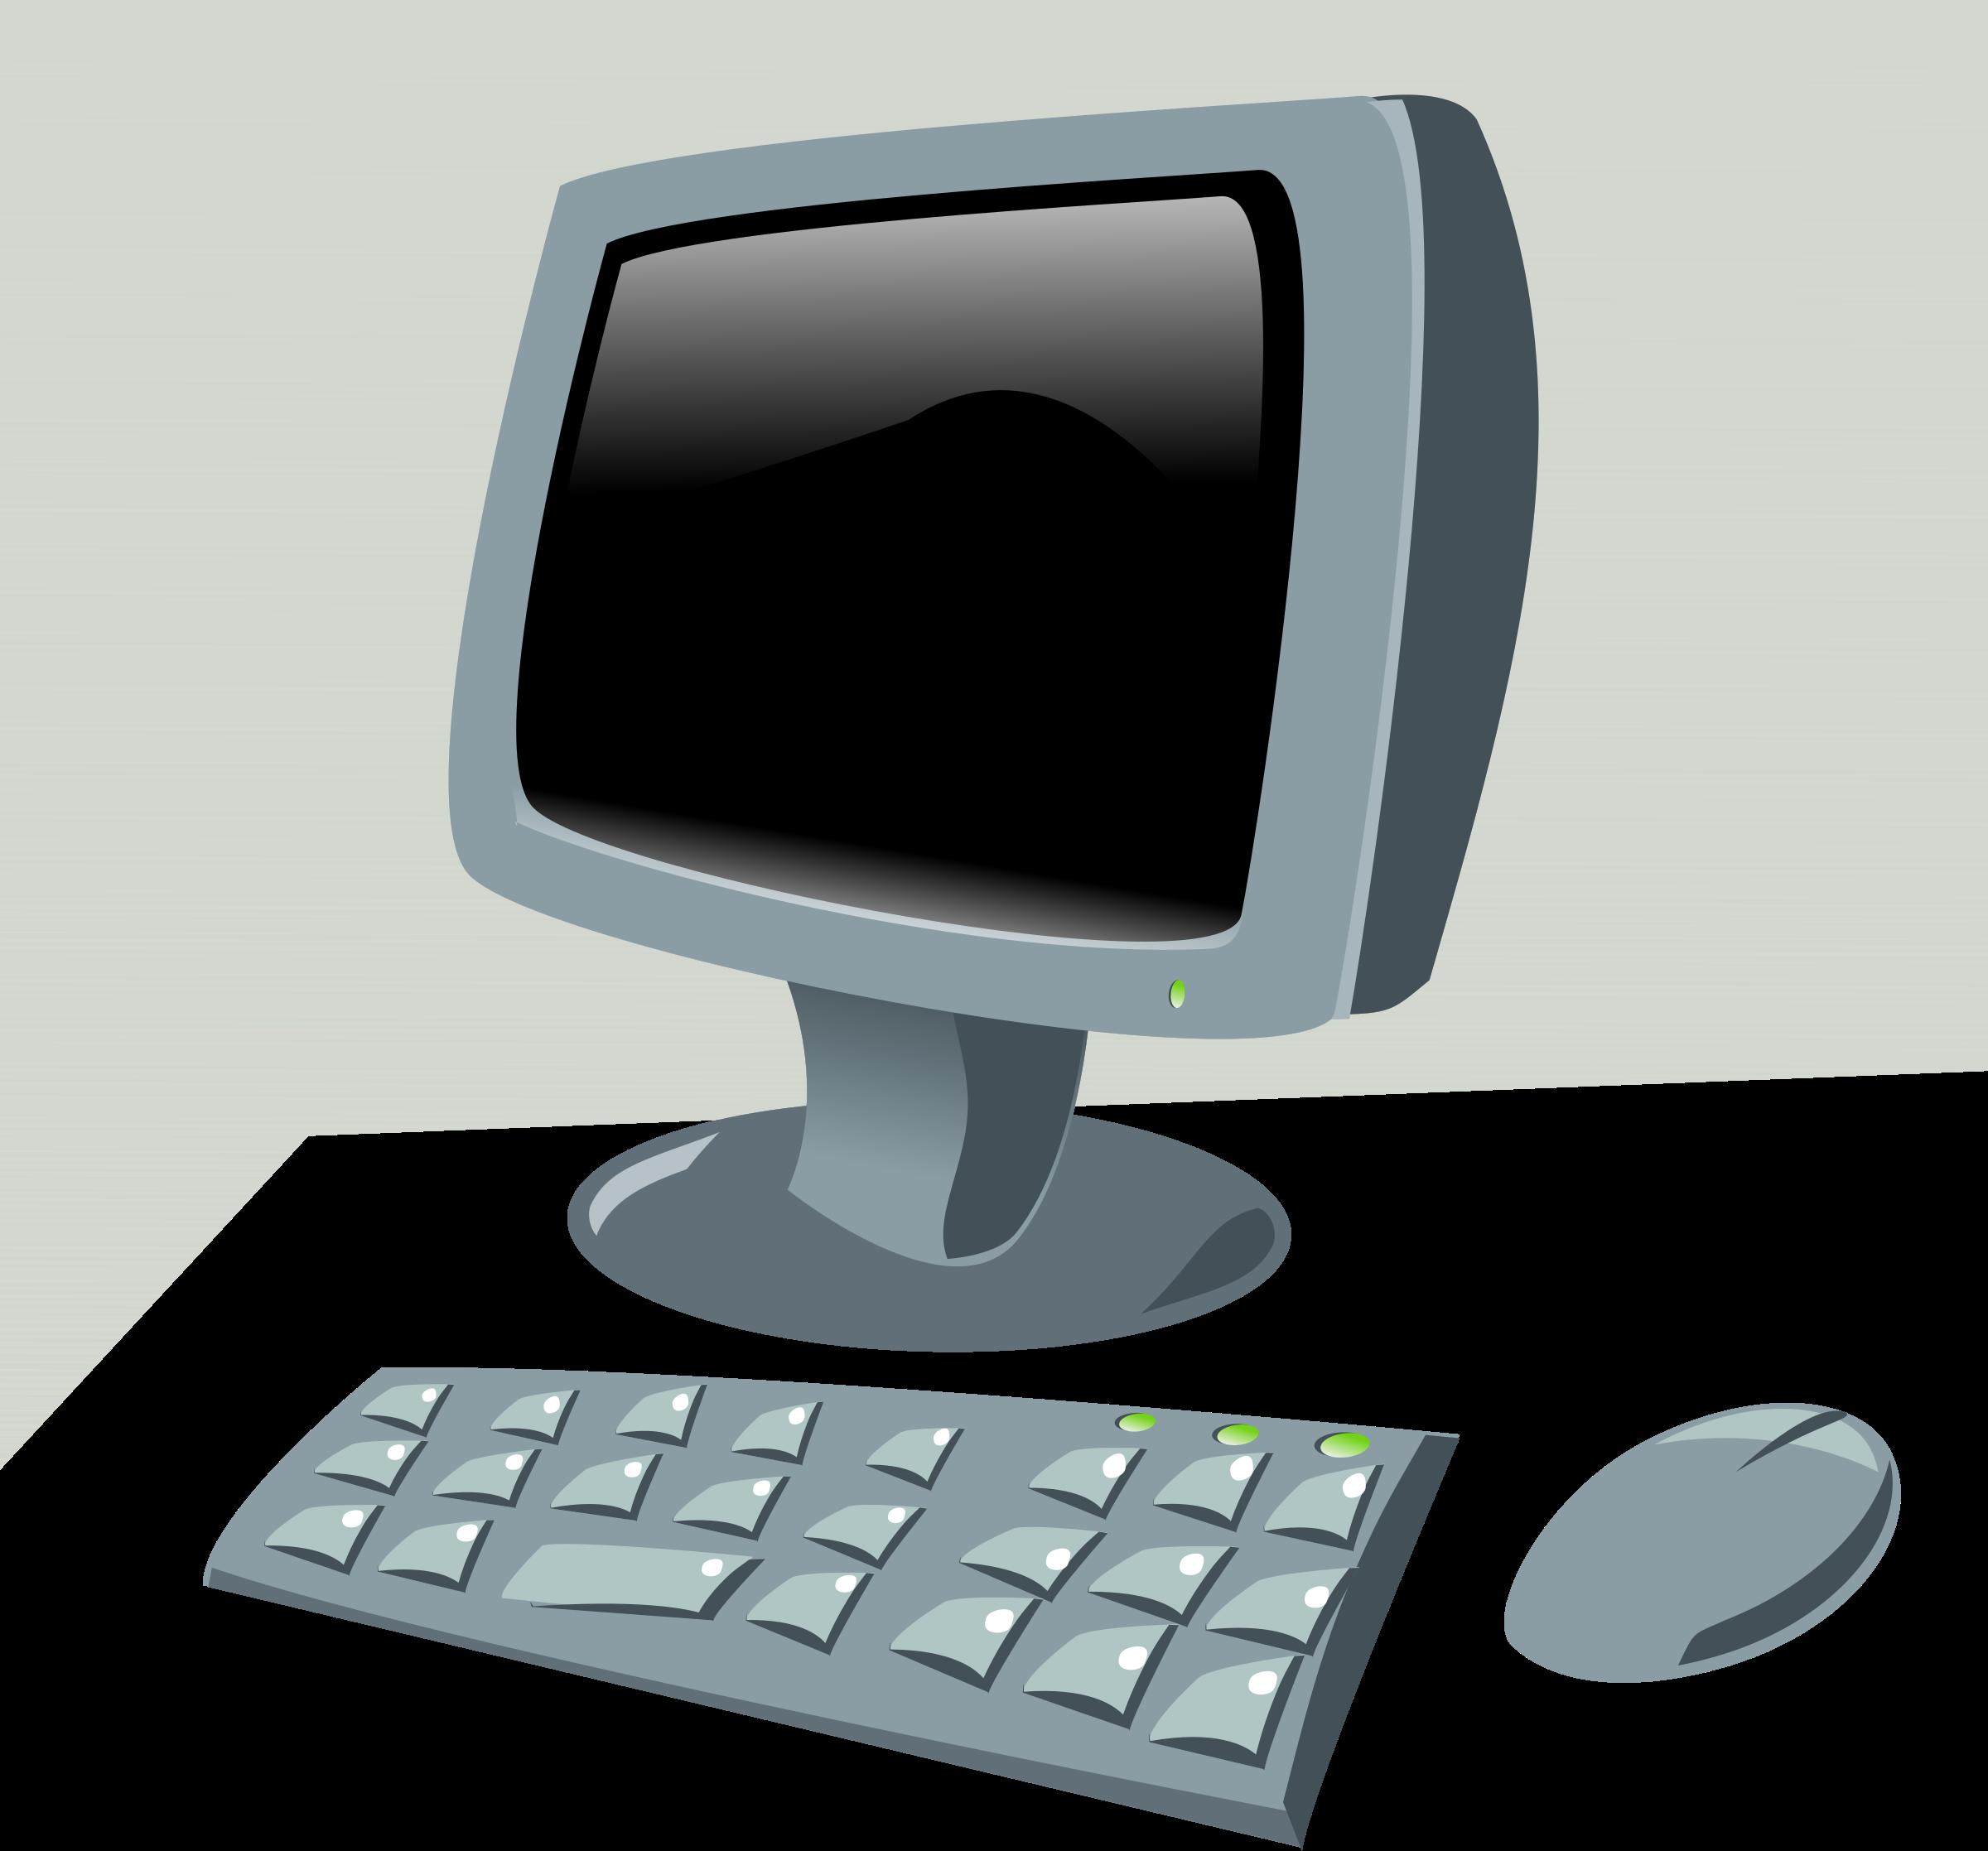 Clipart cartoon big image. Computer clip art computer terminal